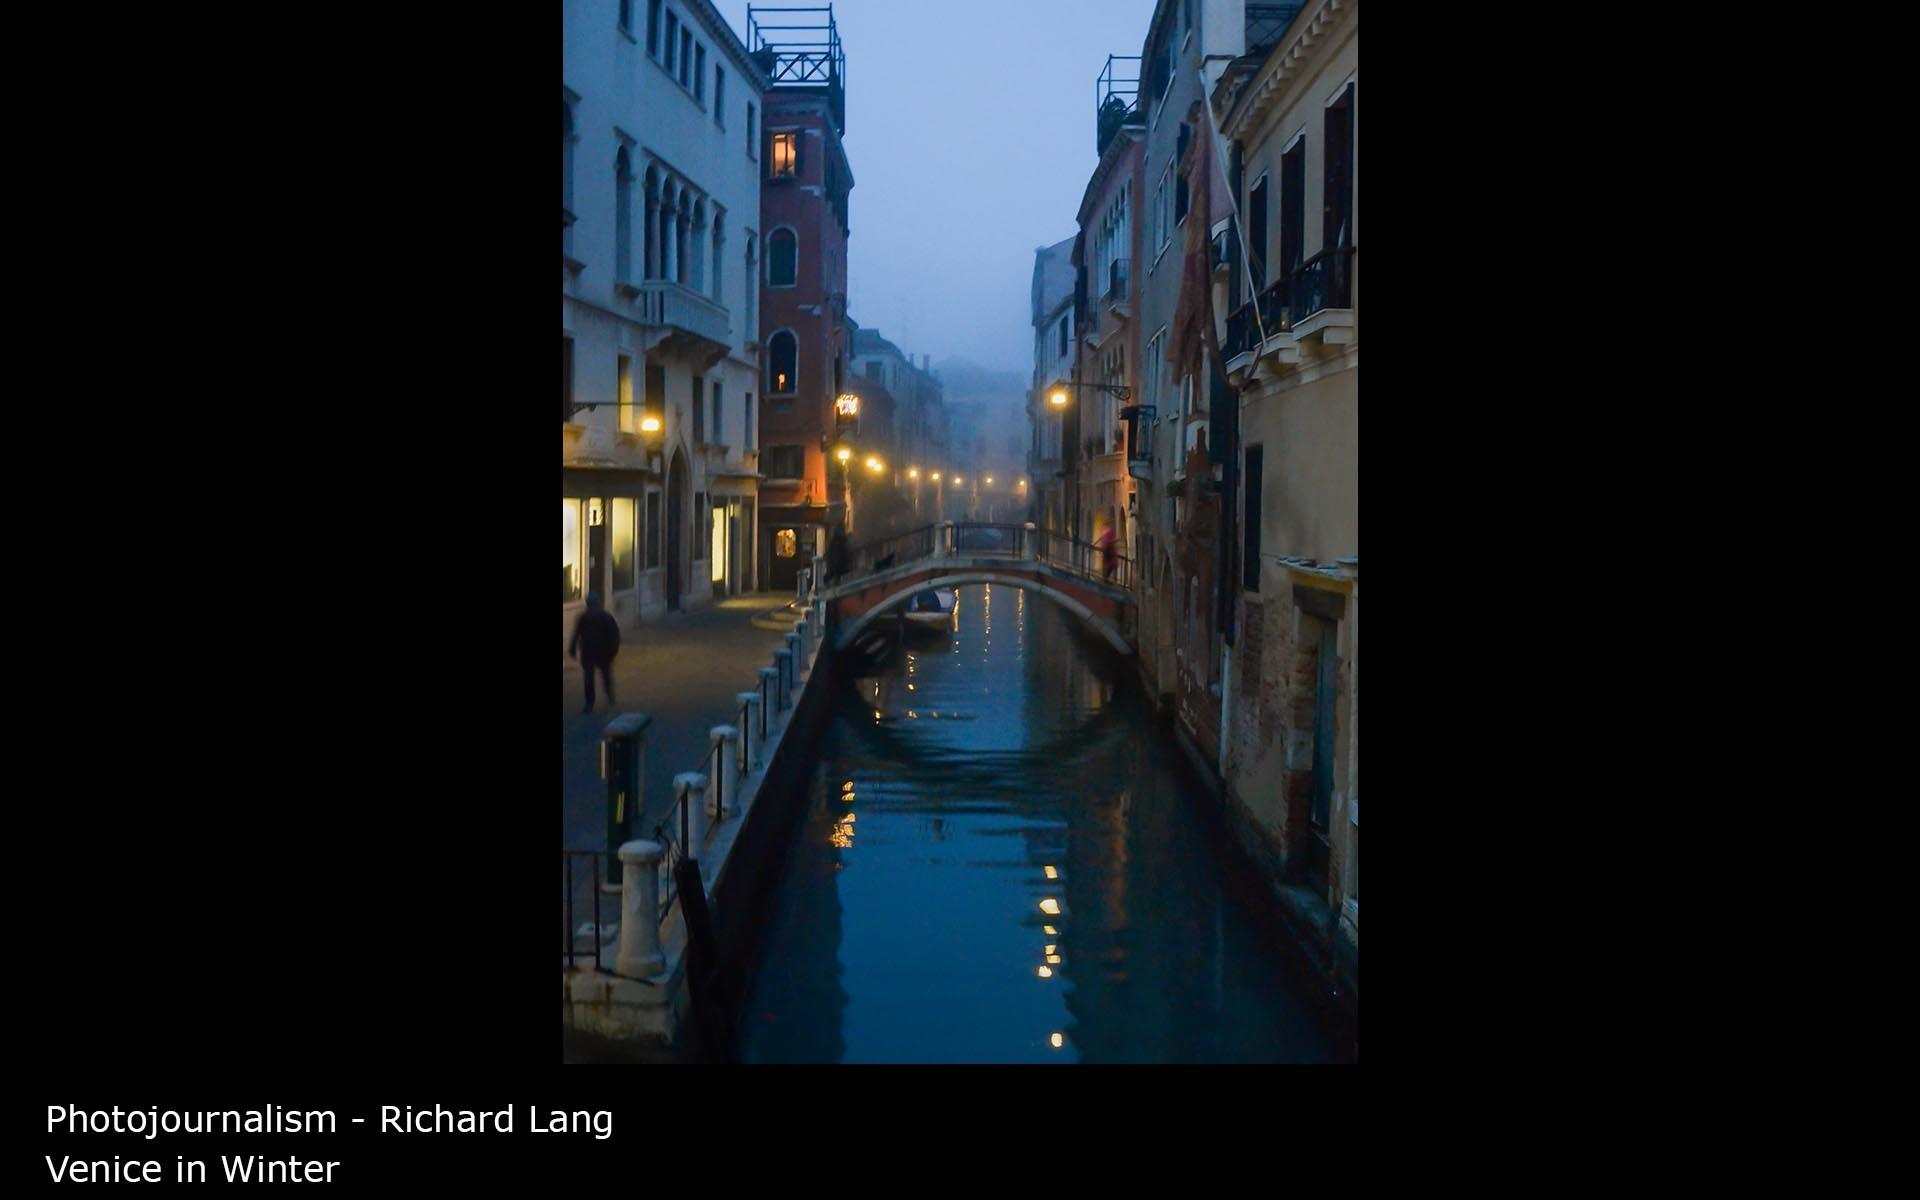 Venice in Winter - Richard Lang